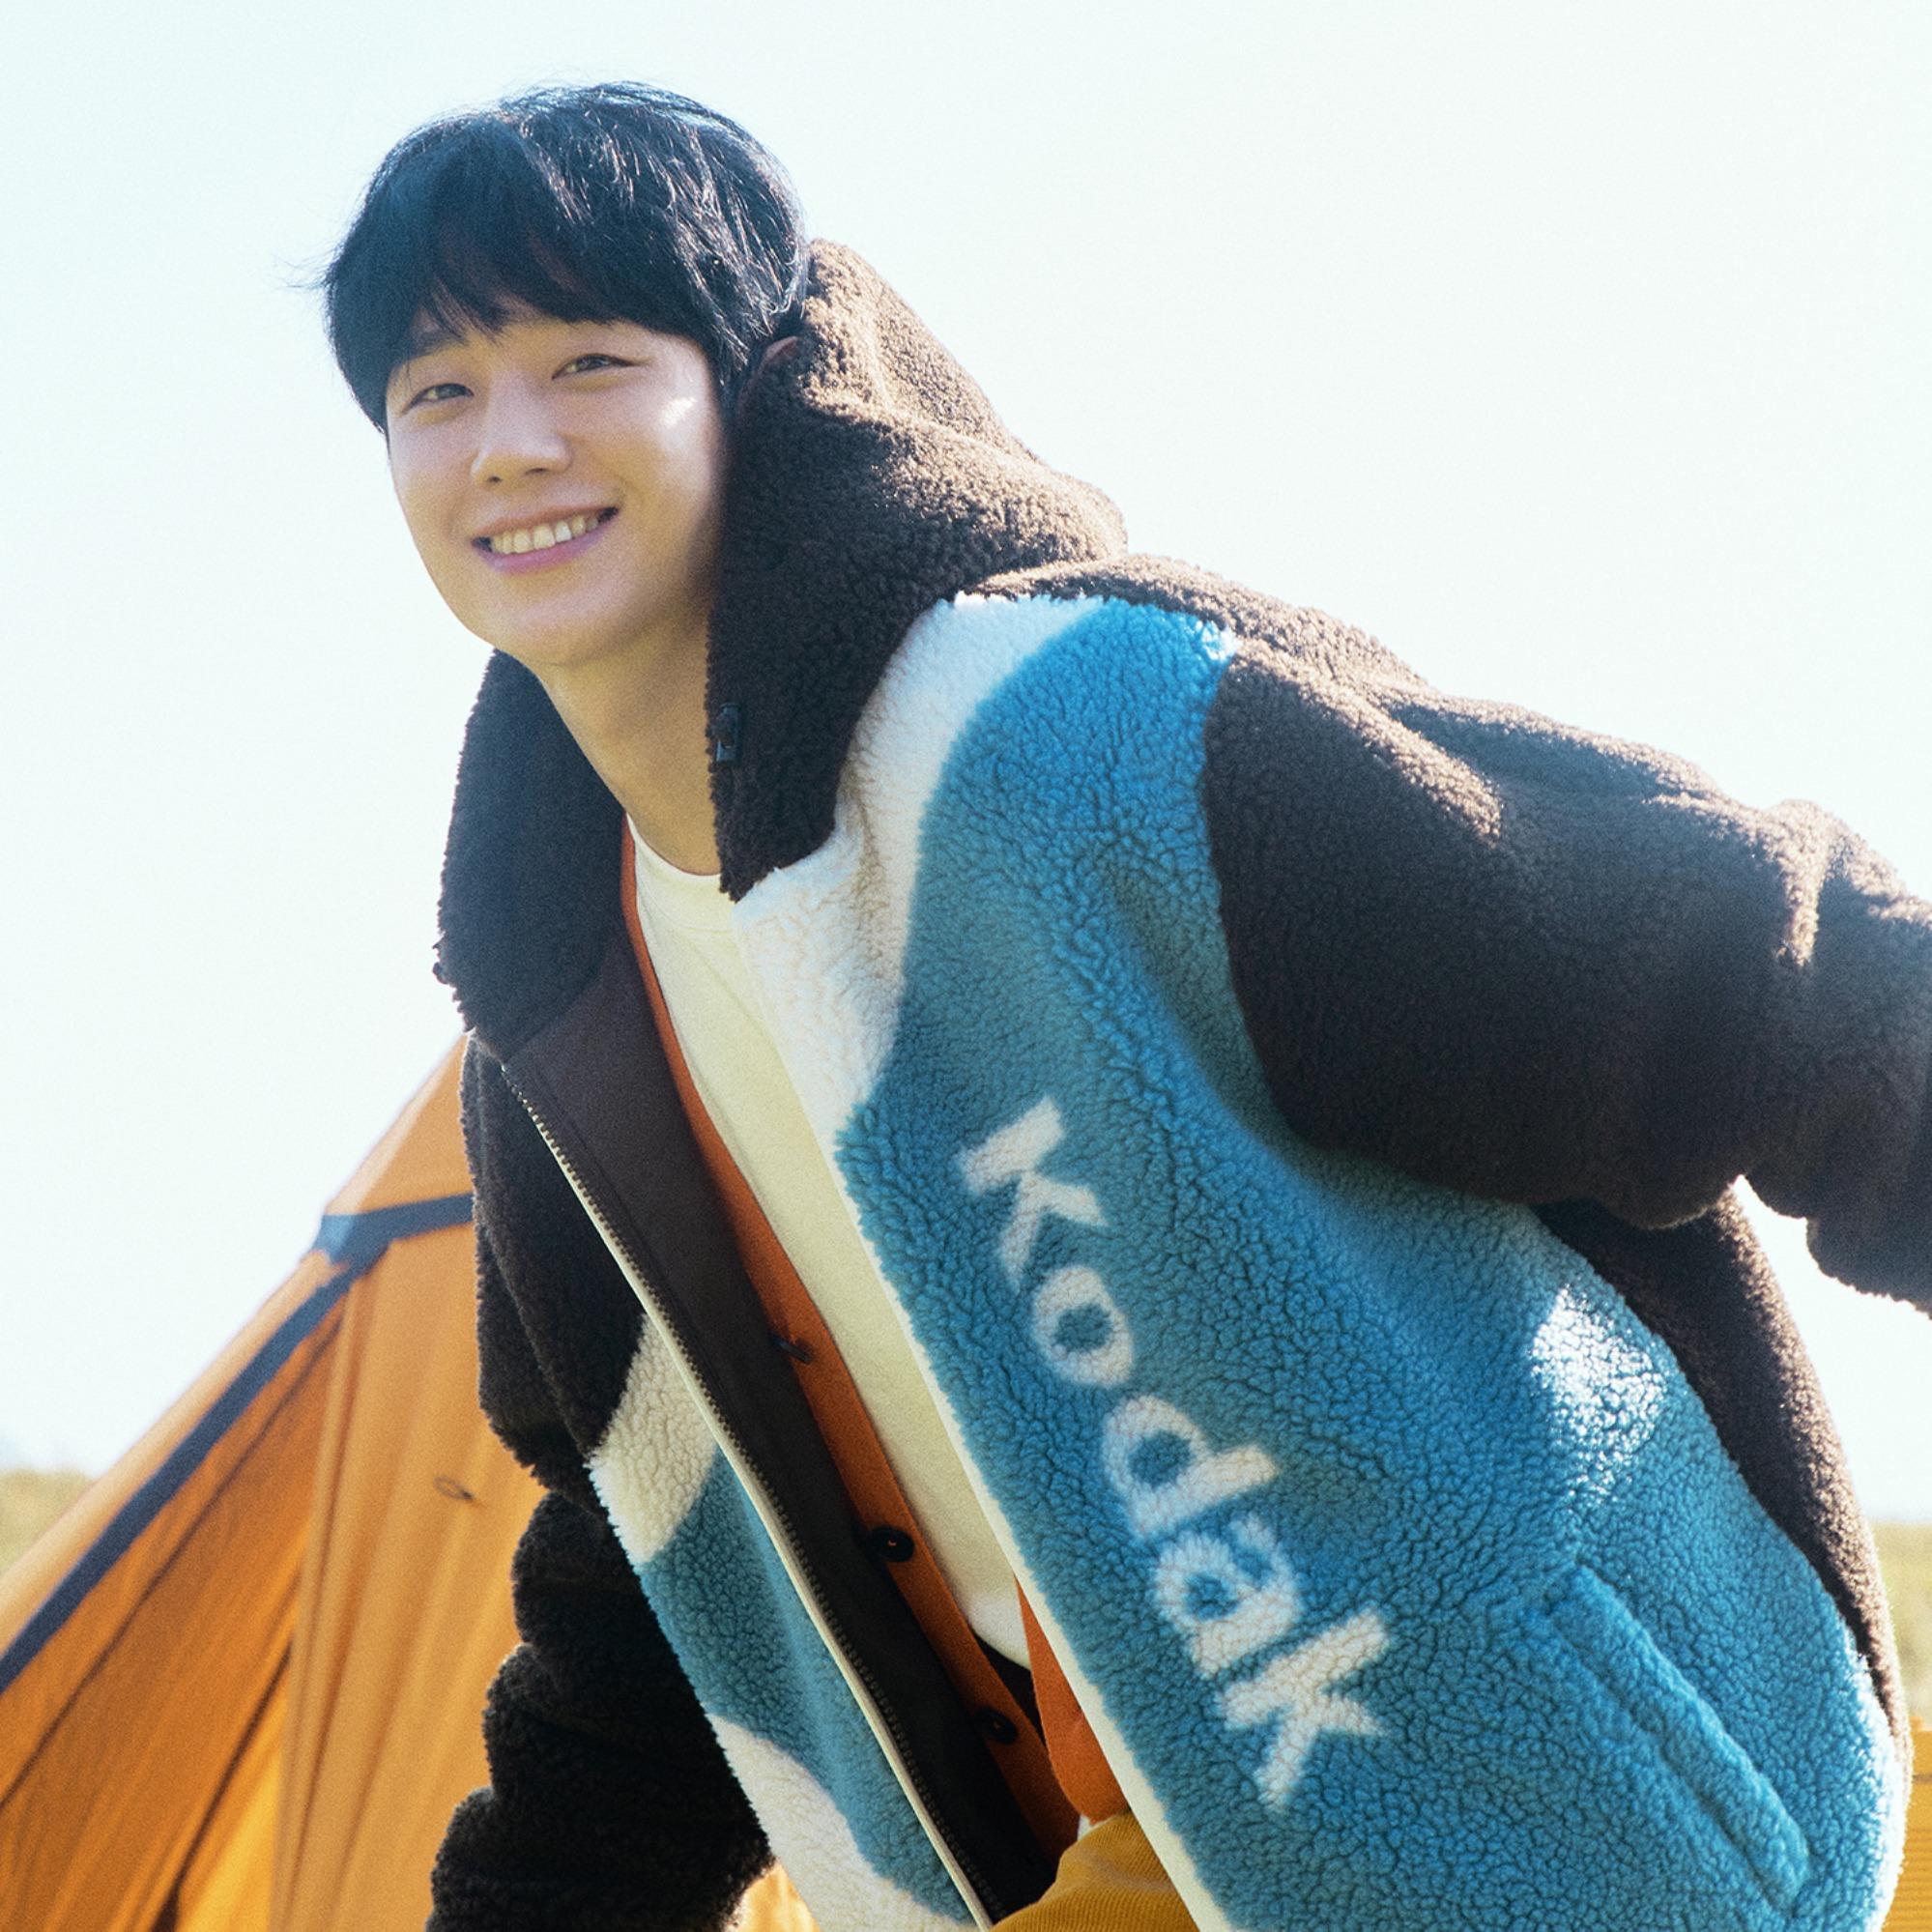 jung-hae-in-selected-as-first-advertising-model-for-kodak-apparel-2